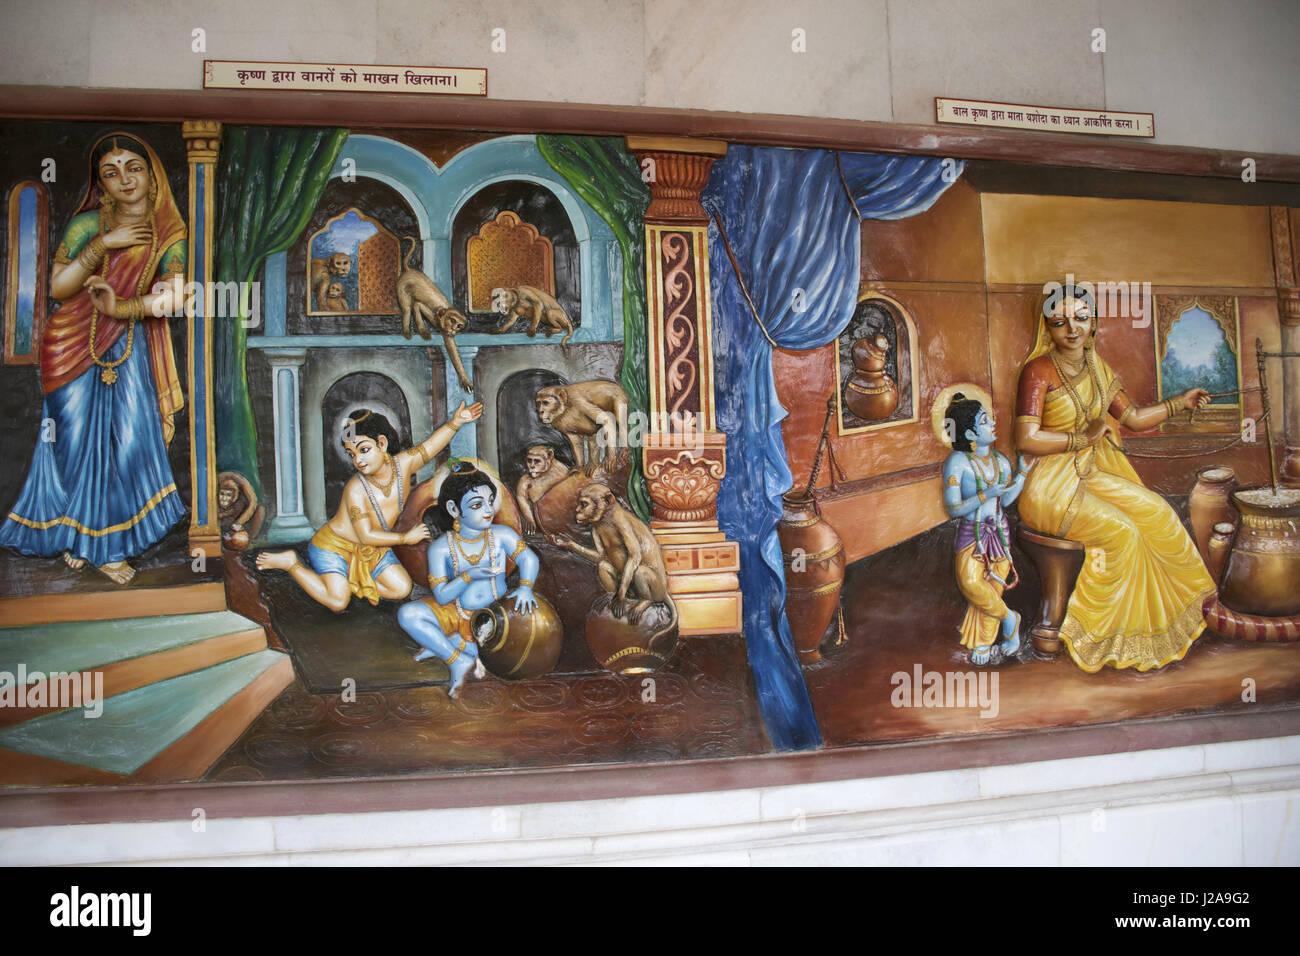 Lord Krishna's childhood scene. Iskcon temple, Pune, Maharashtra - Stock Image